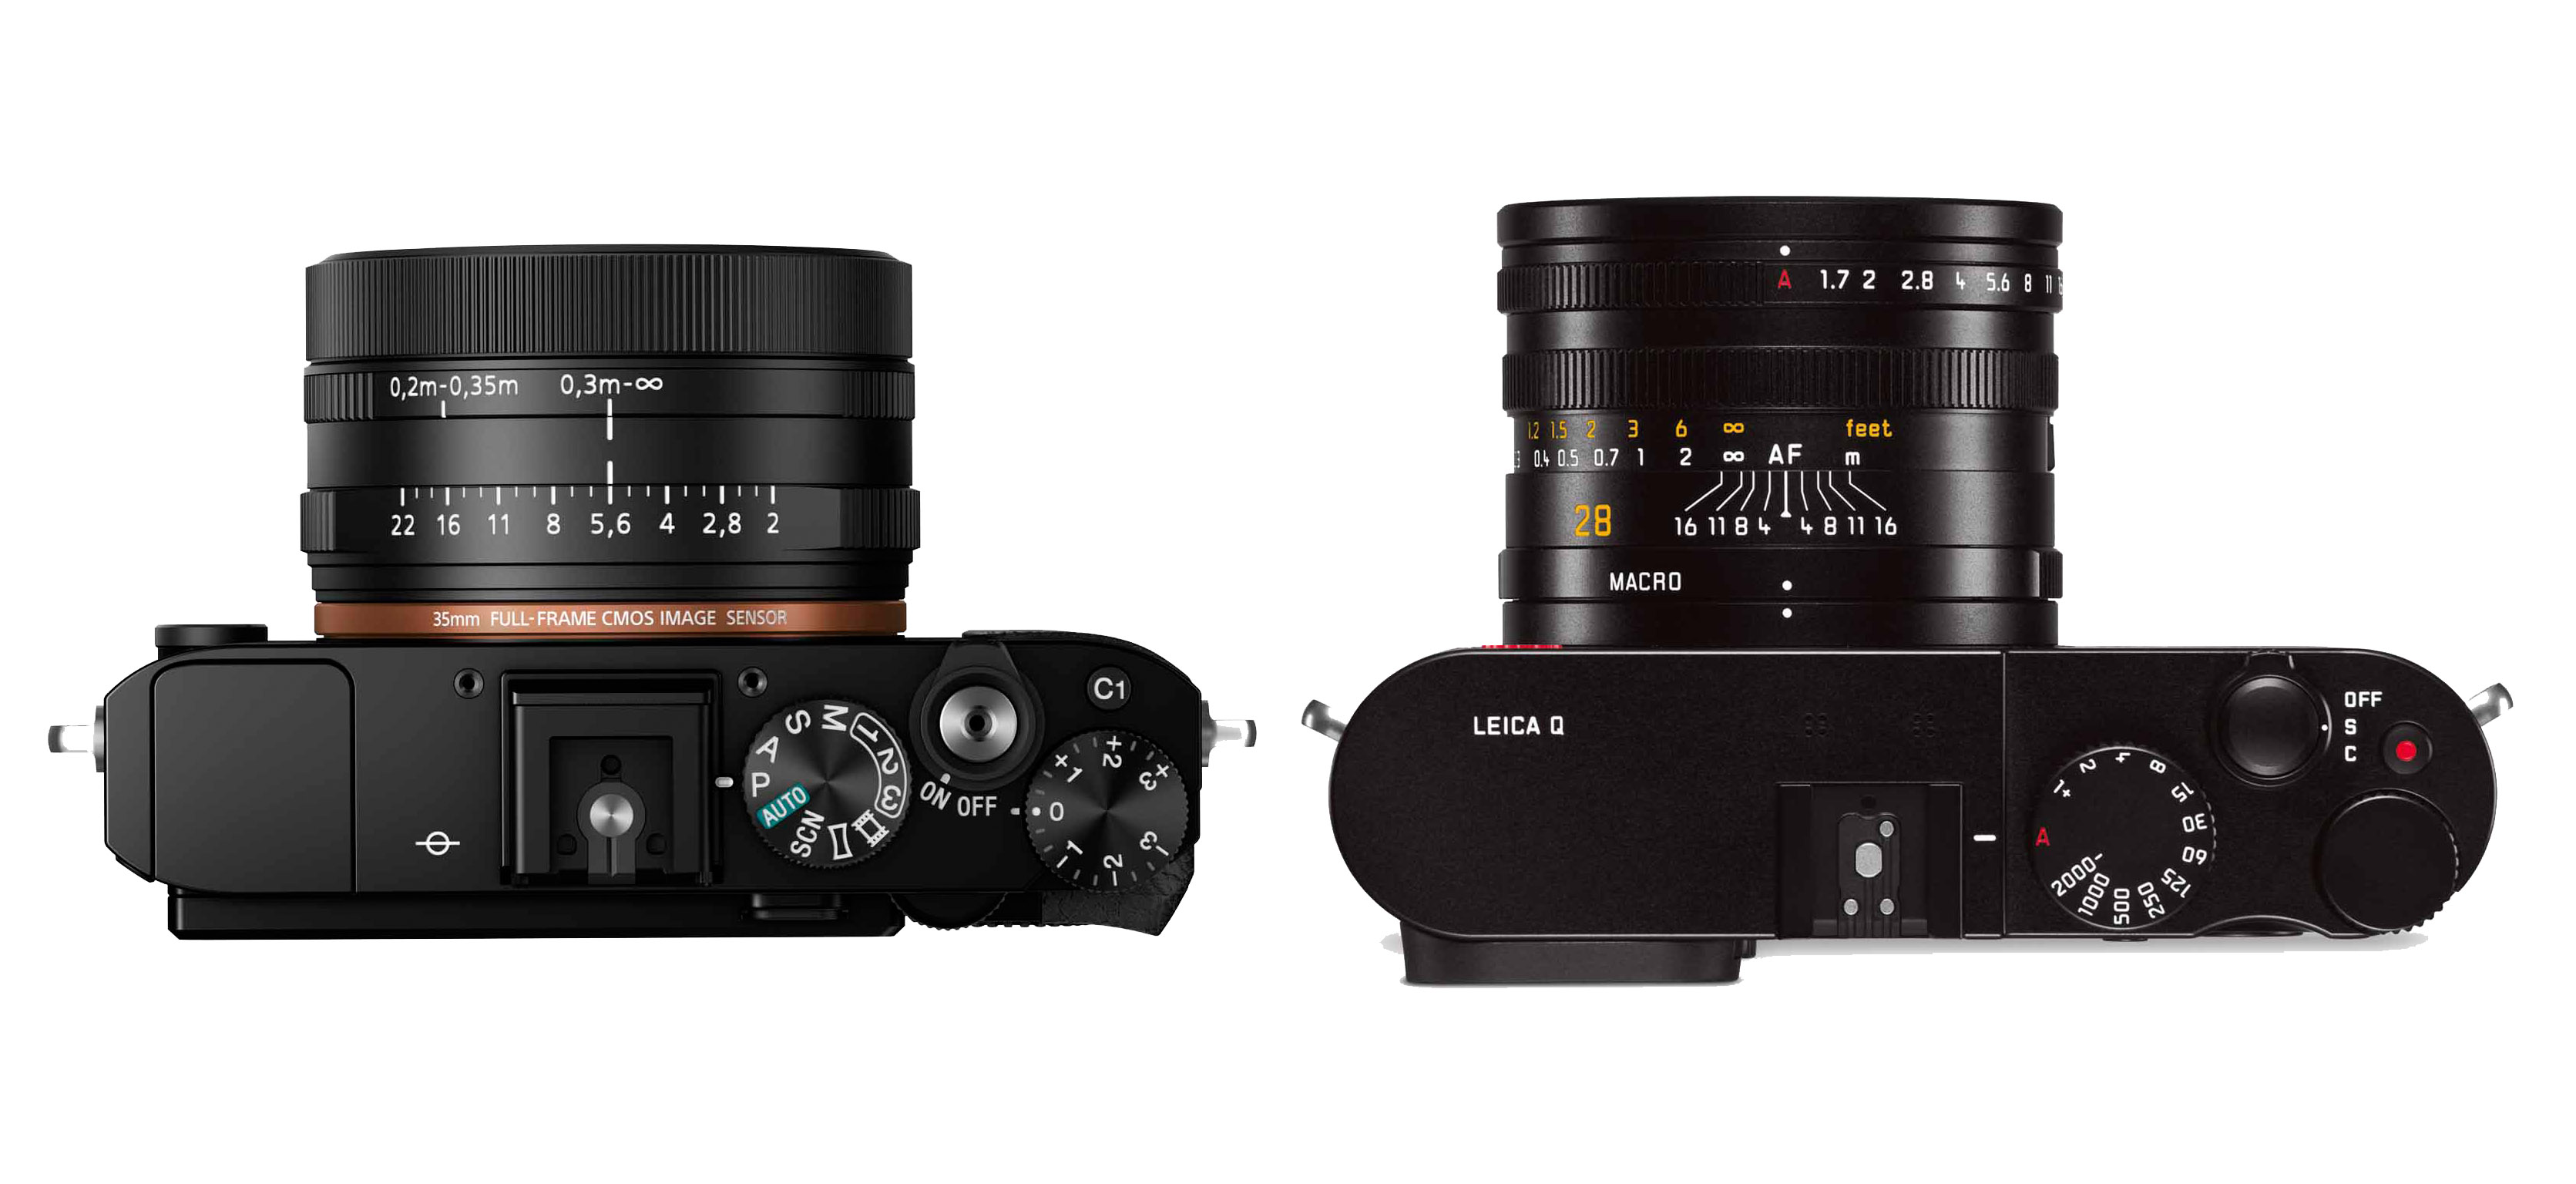 Sony RX1 R II vs Leica Q (Typ 116) - Amateur Photographer